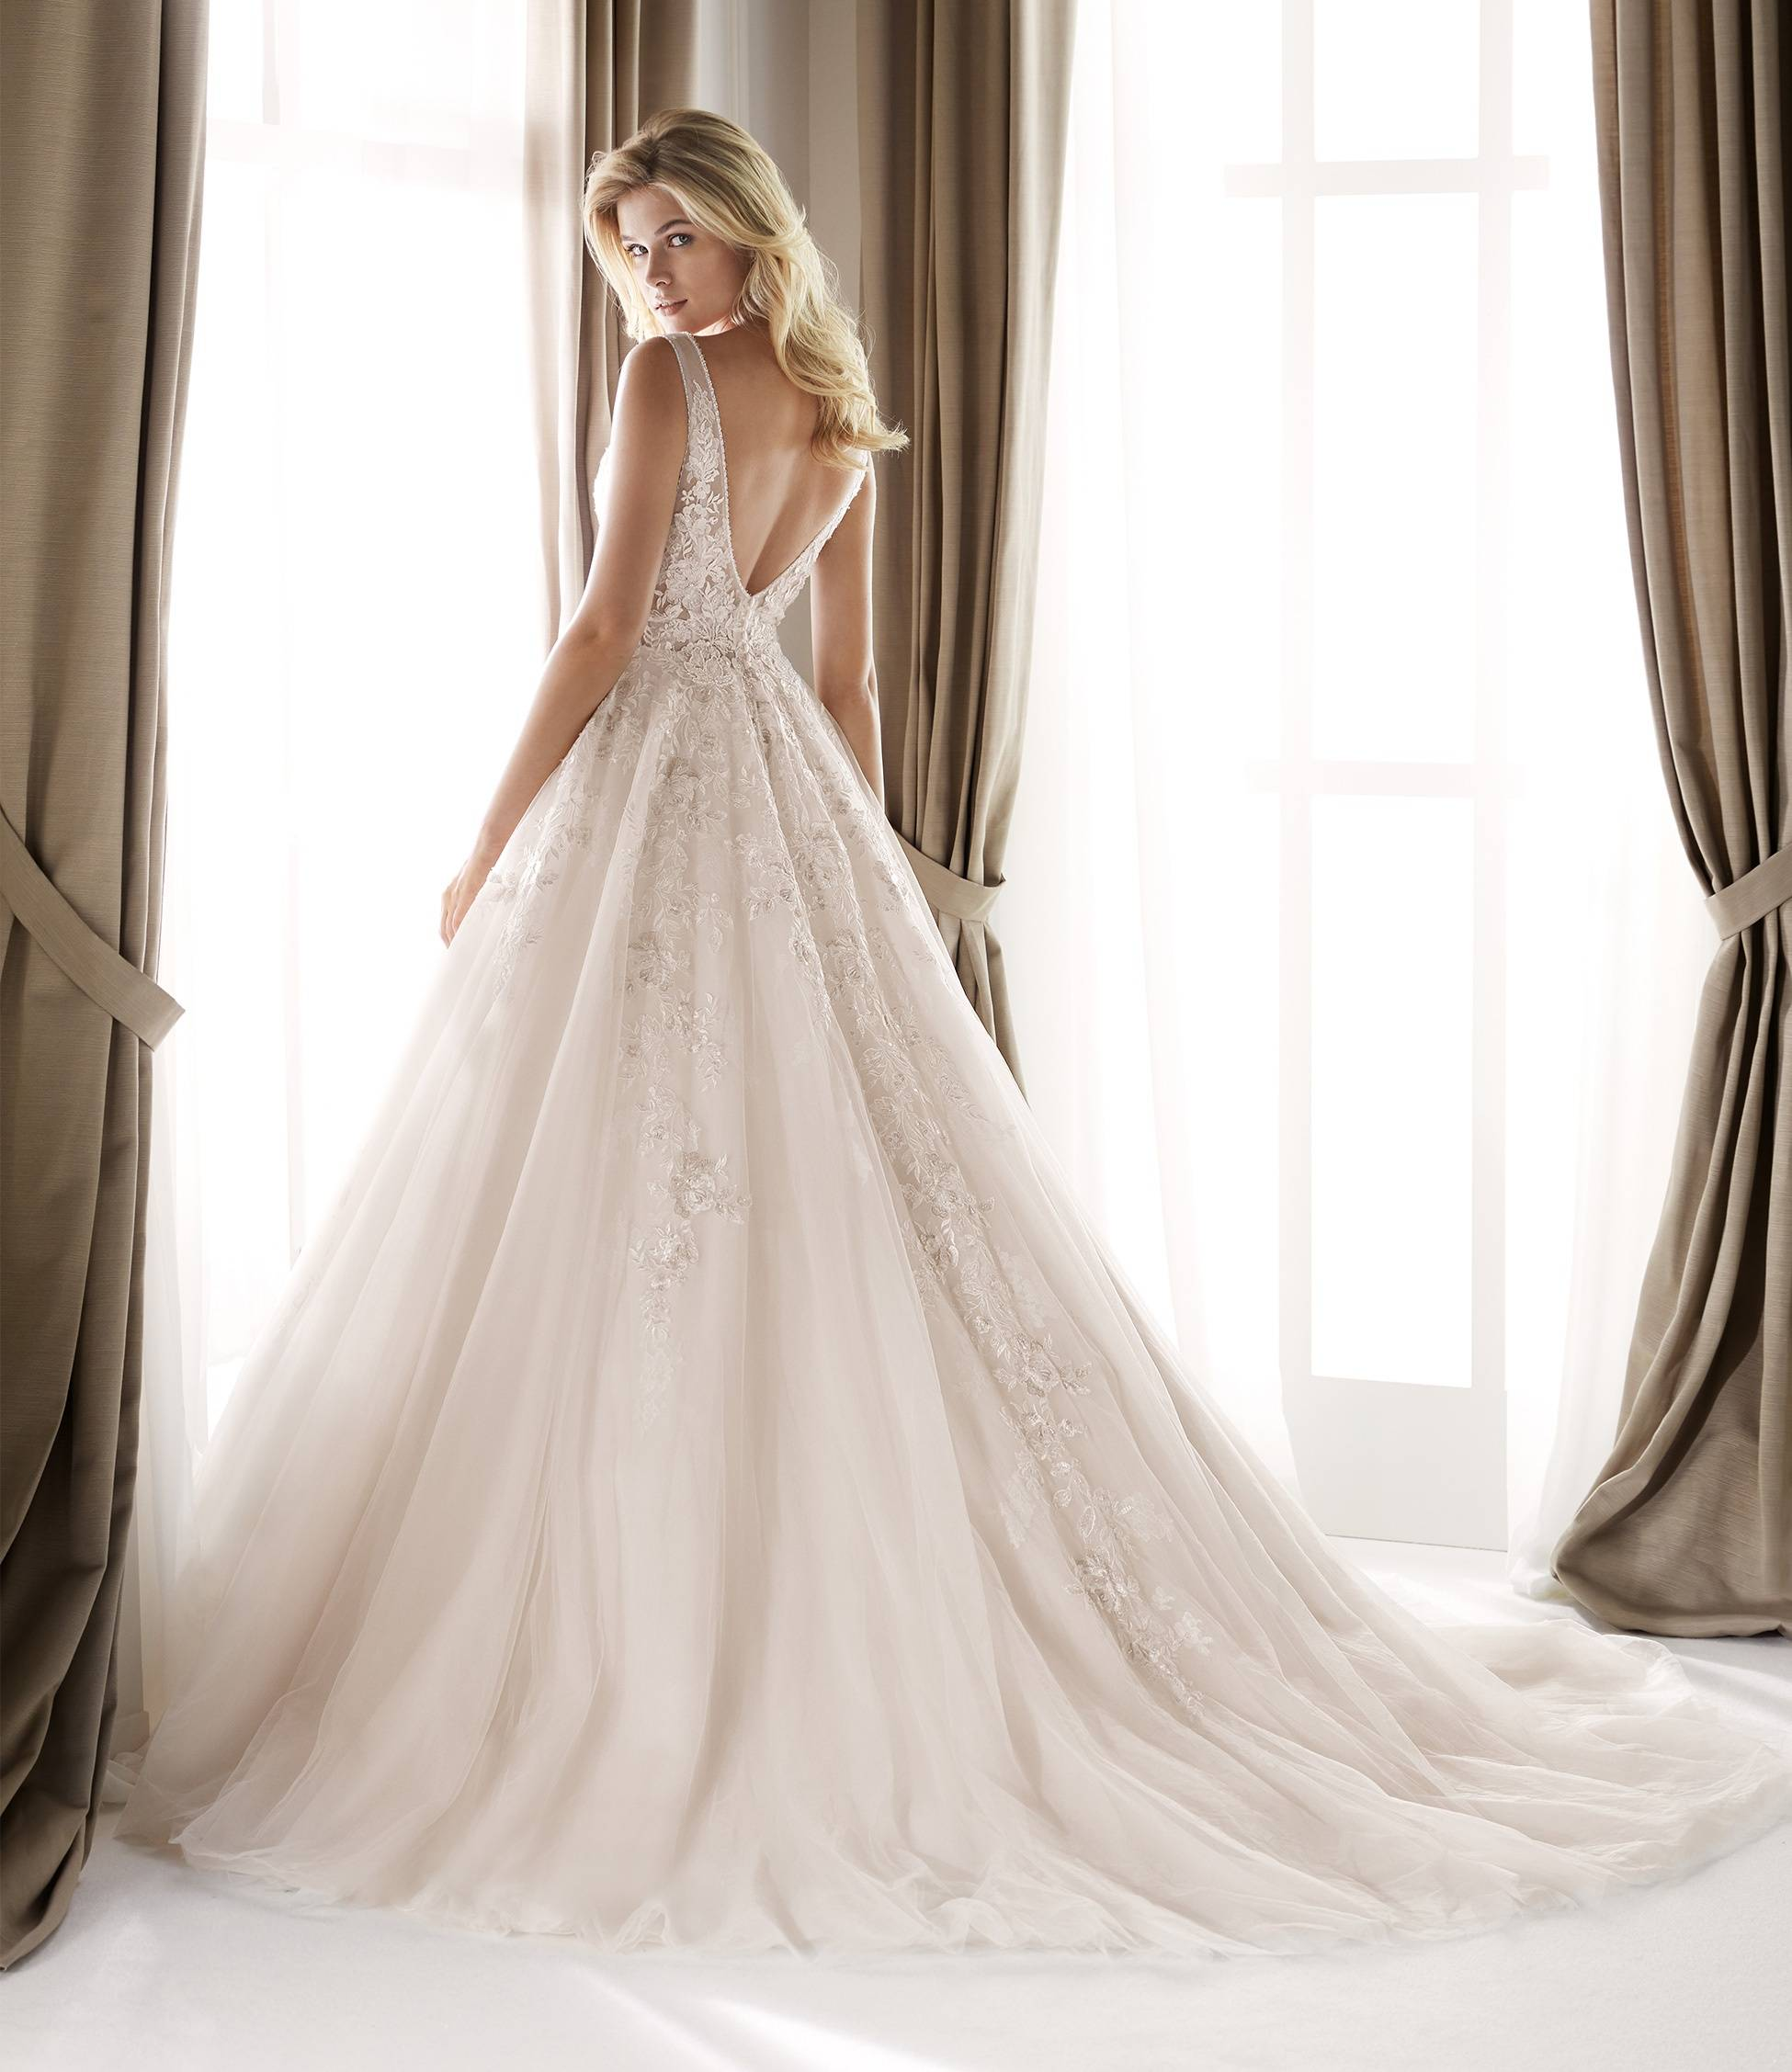 NICOLE MILANO NIA20221 DRESS